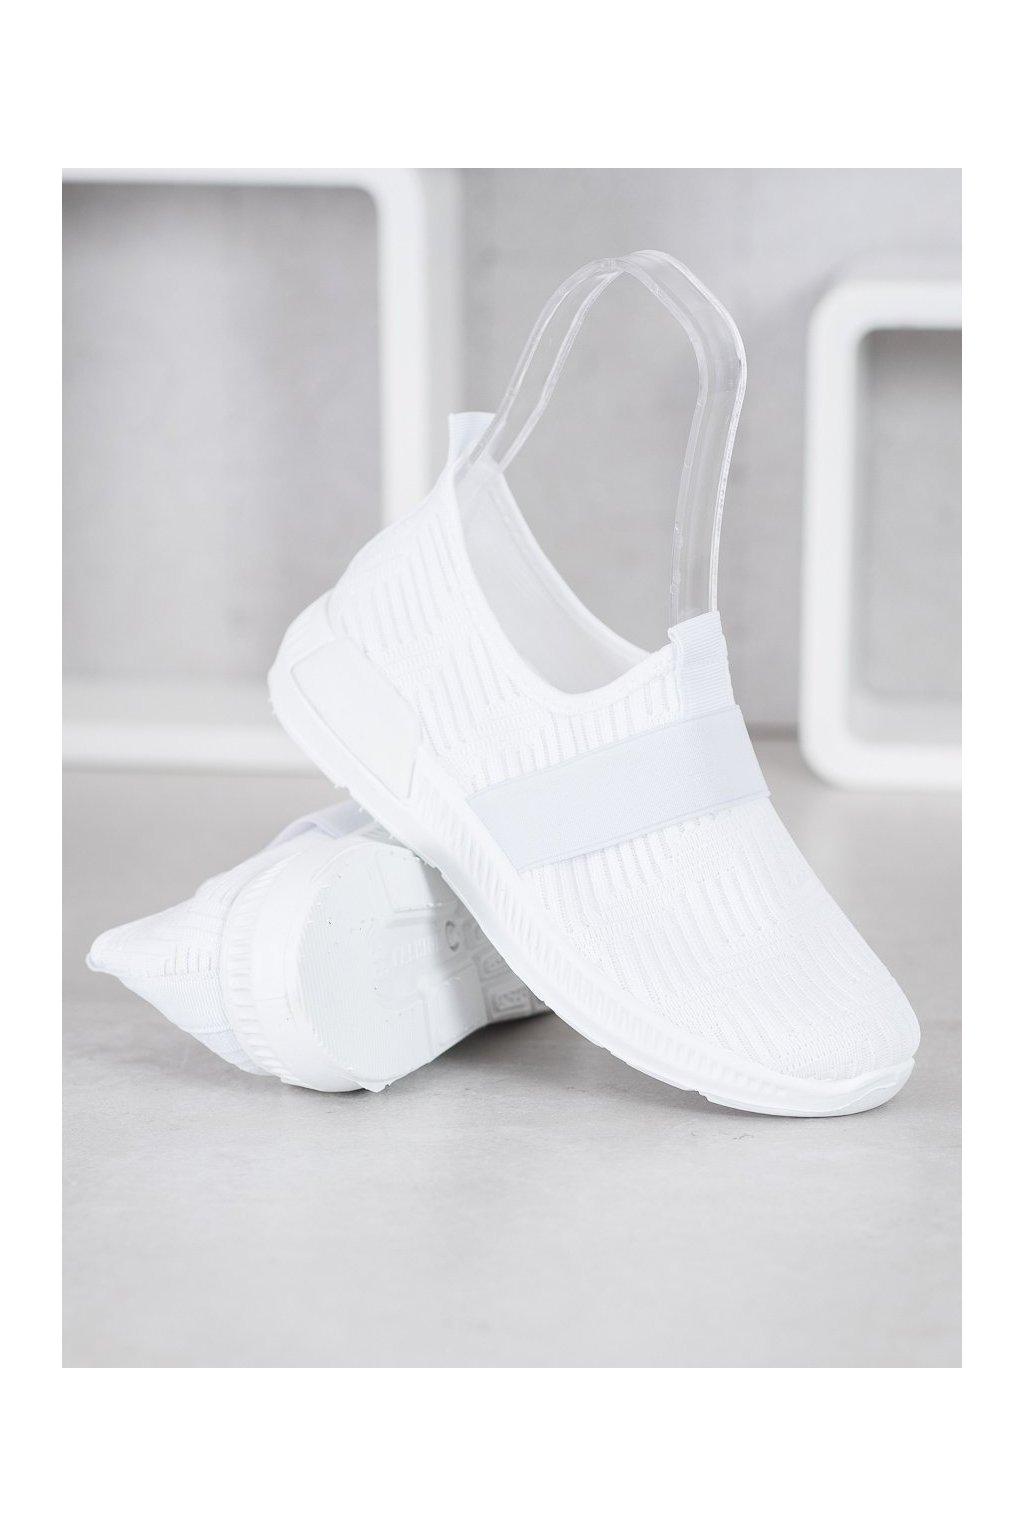 Biele tenisky Shelovet NJSK 7-K2026W